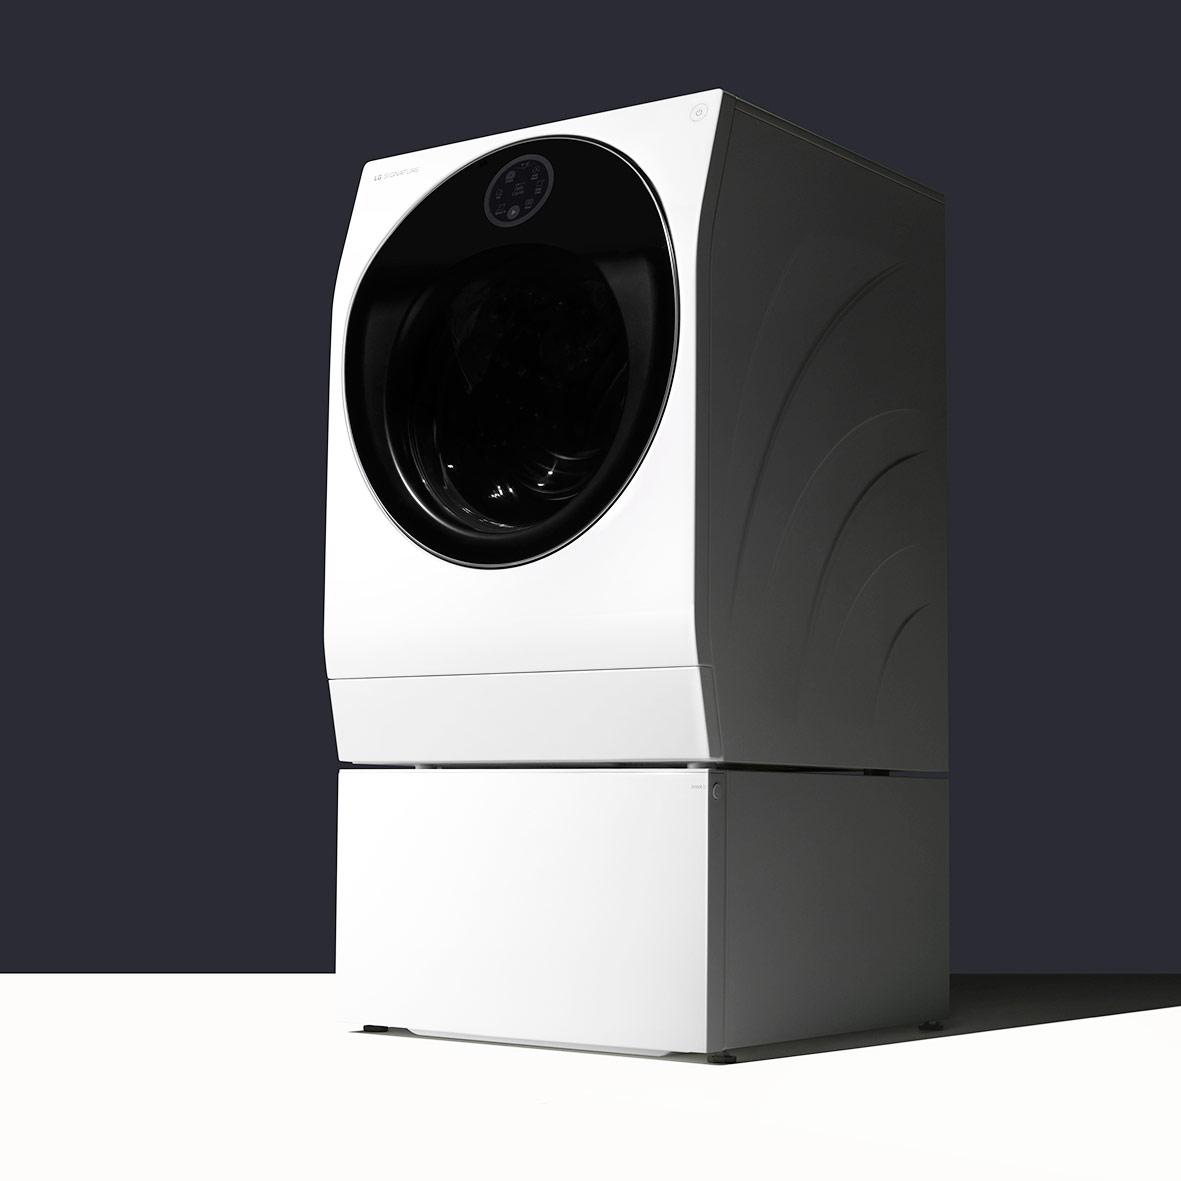 LG Launches New Ultra-Luxury 'LG SIGNATURE' Range In Berlin 11